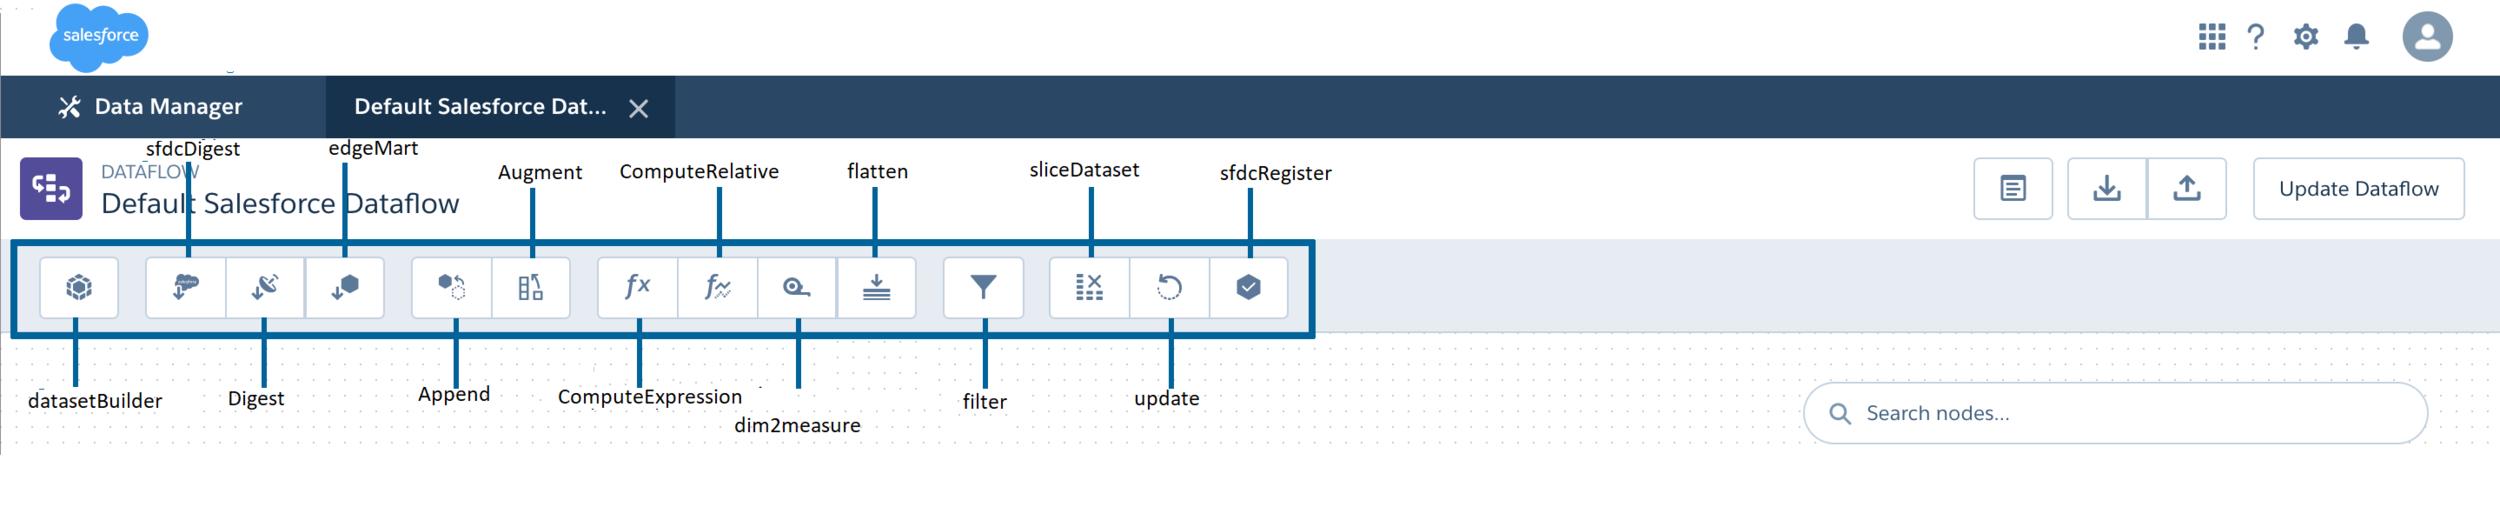 DataflowTools